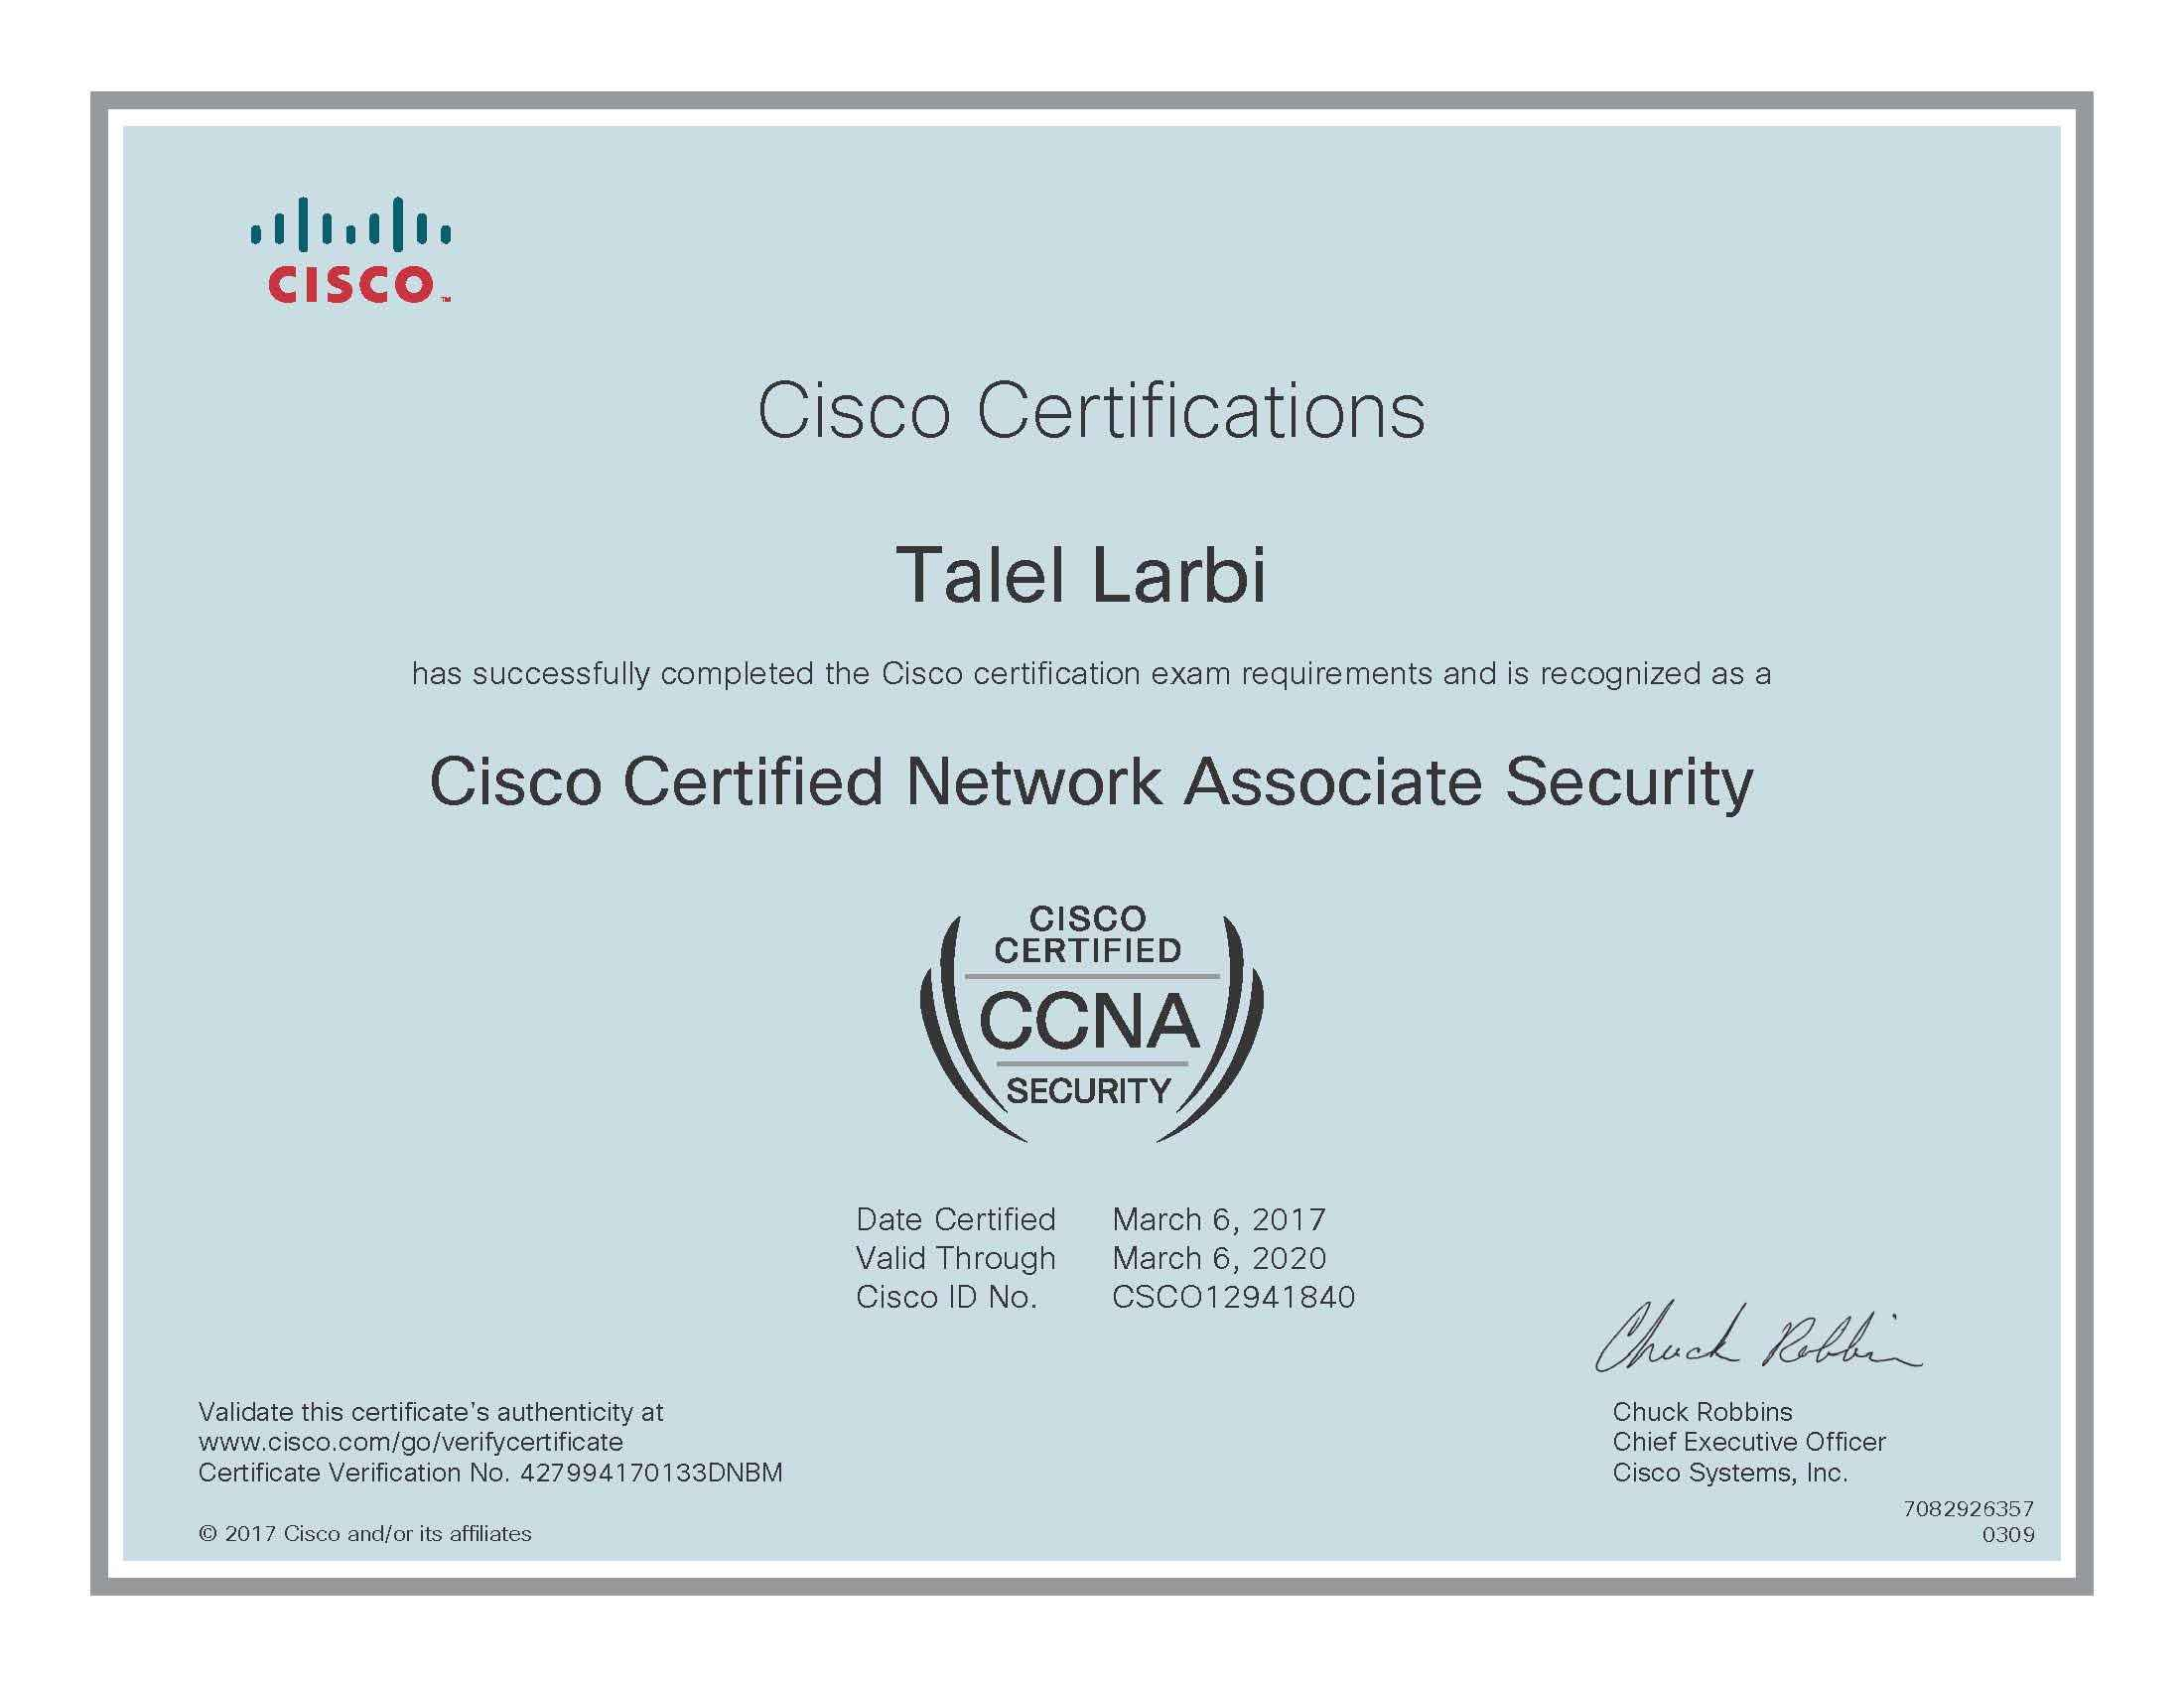 Talel larbi ceh pmp ccna security itil mcsa bayt cisco certified network associate security ccna security certificate xflitez Gallery